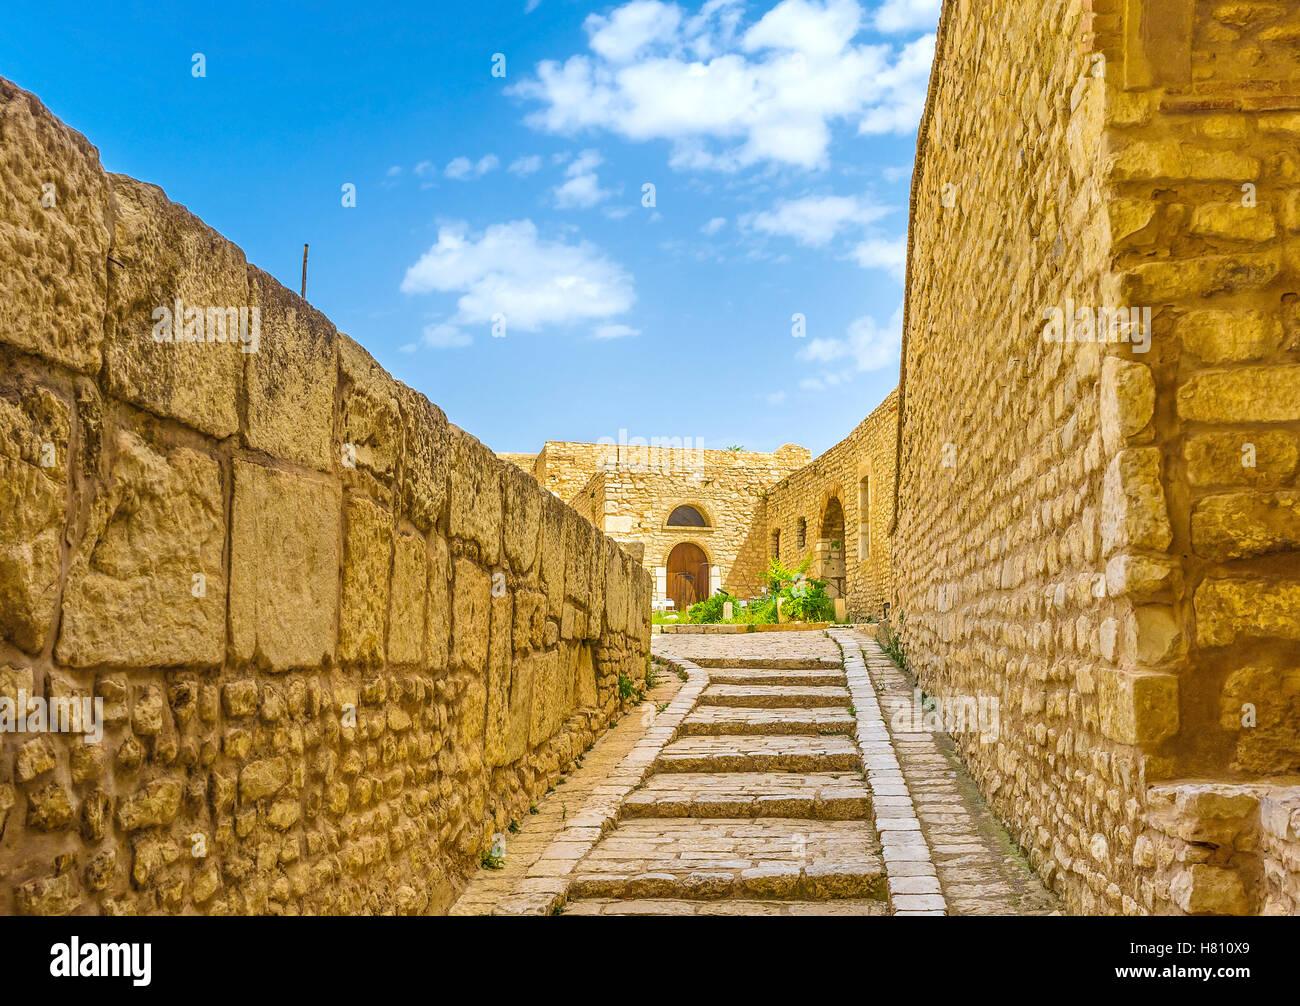 The narrow path between Big and Small forts of Kasbah, El Kef, Tunisia. - Stock Image